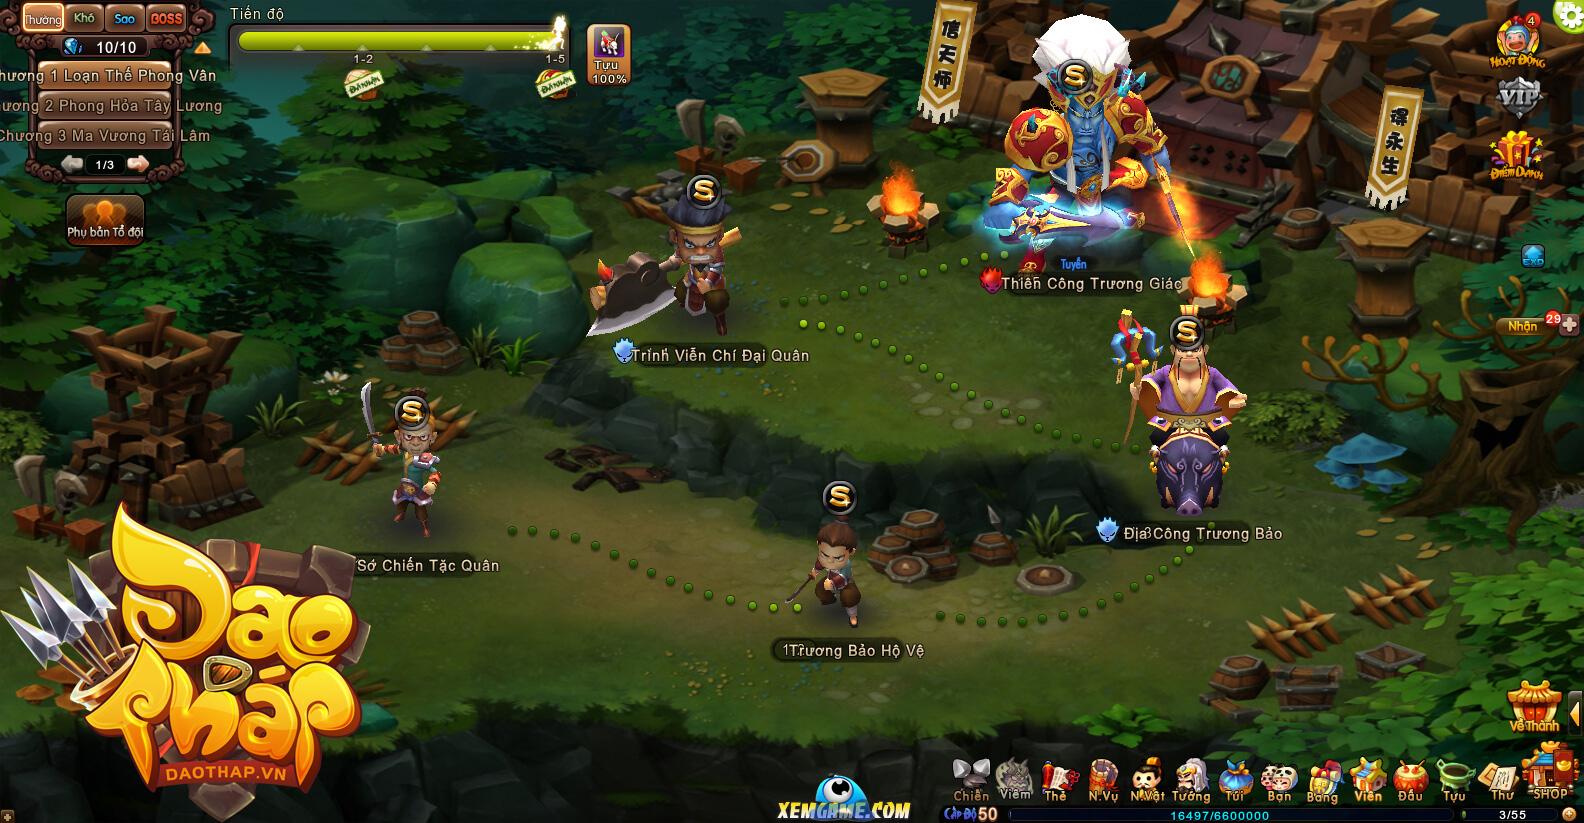 game-dao-thap-online-8.jpg (1584×823)